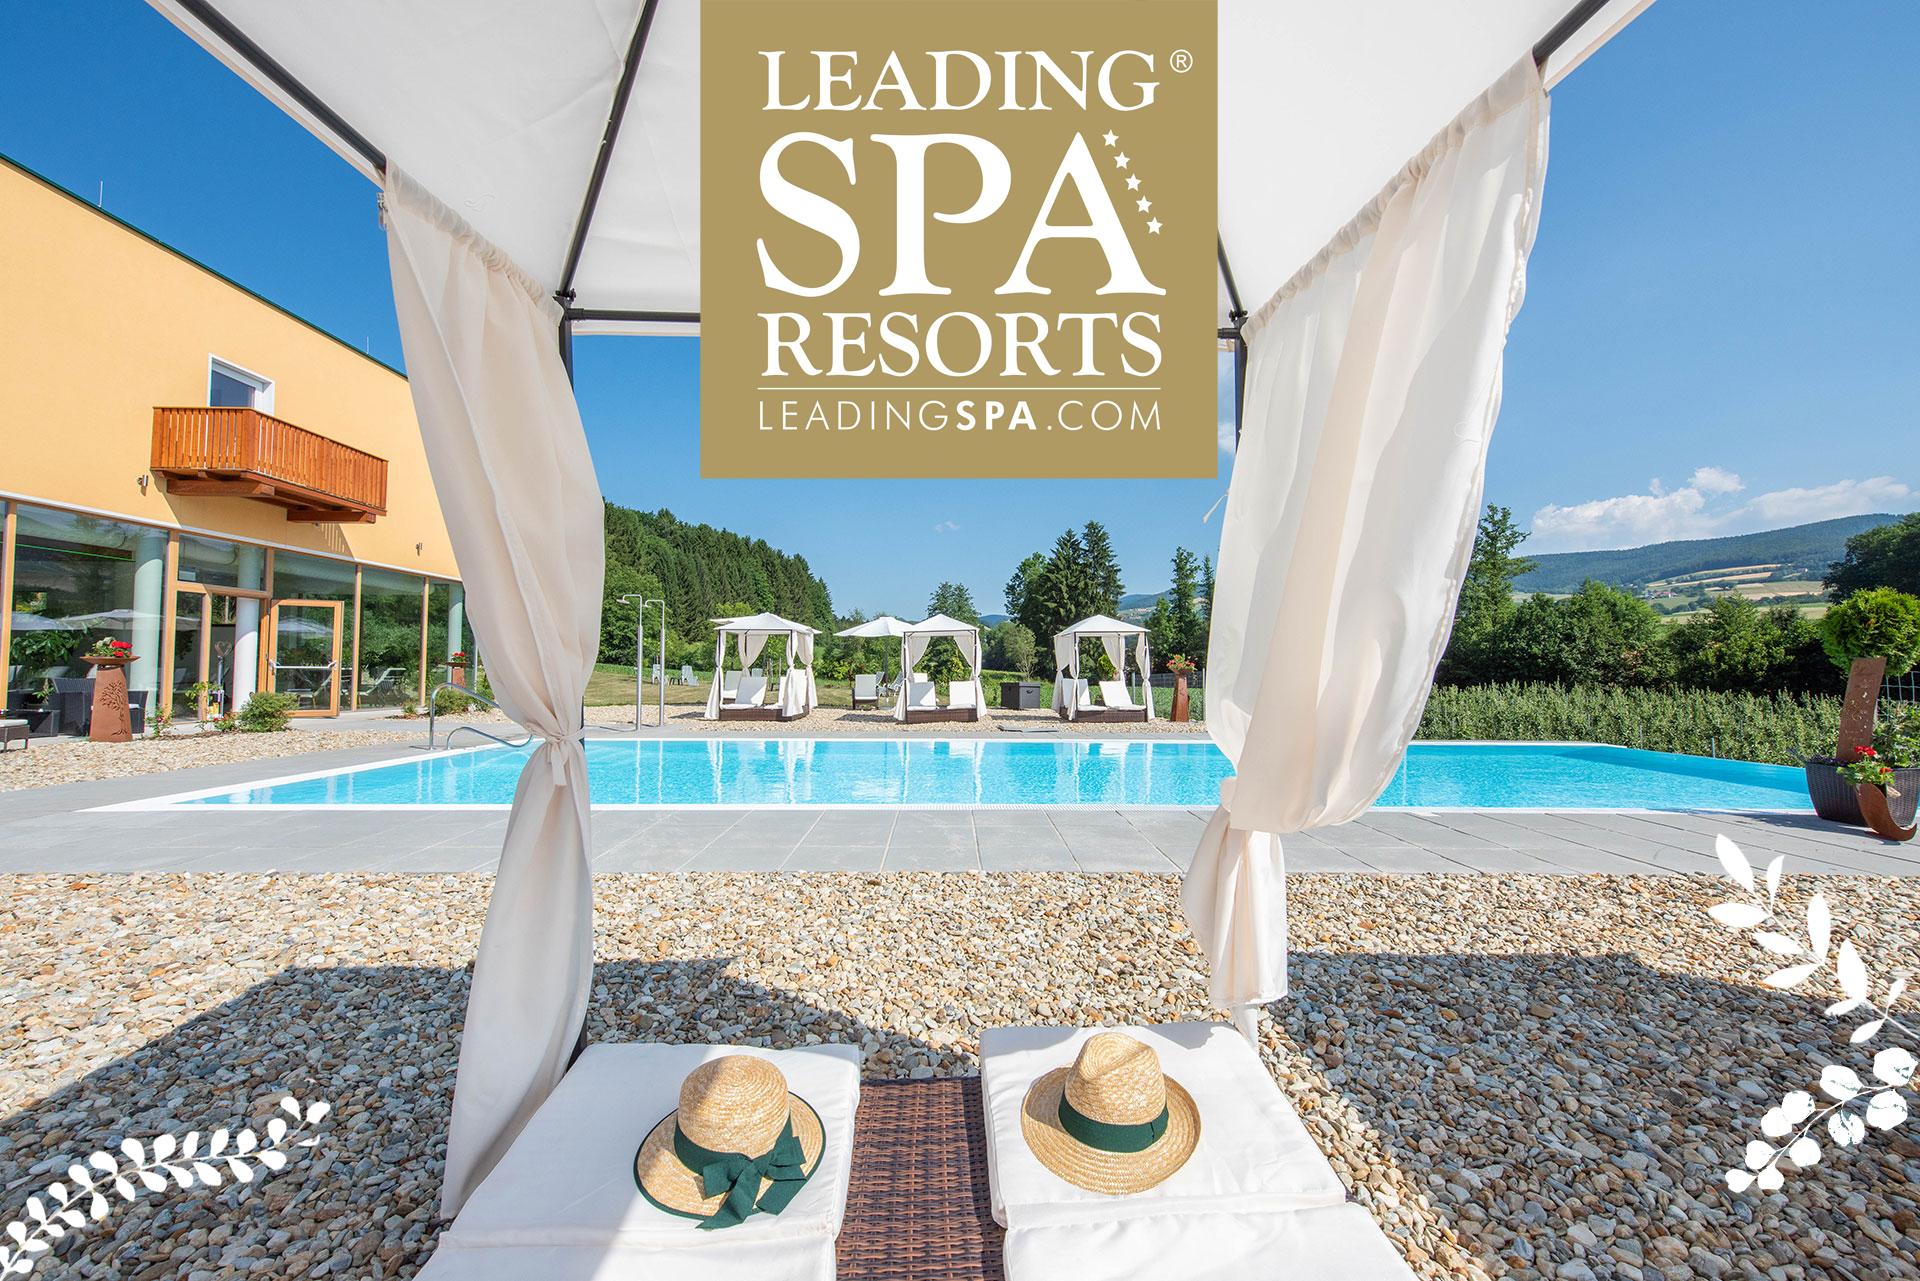 Außenpool_leading-spa-resorts2